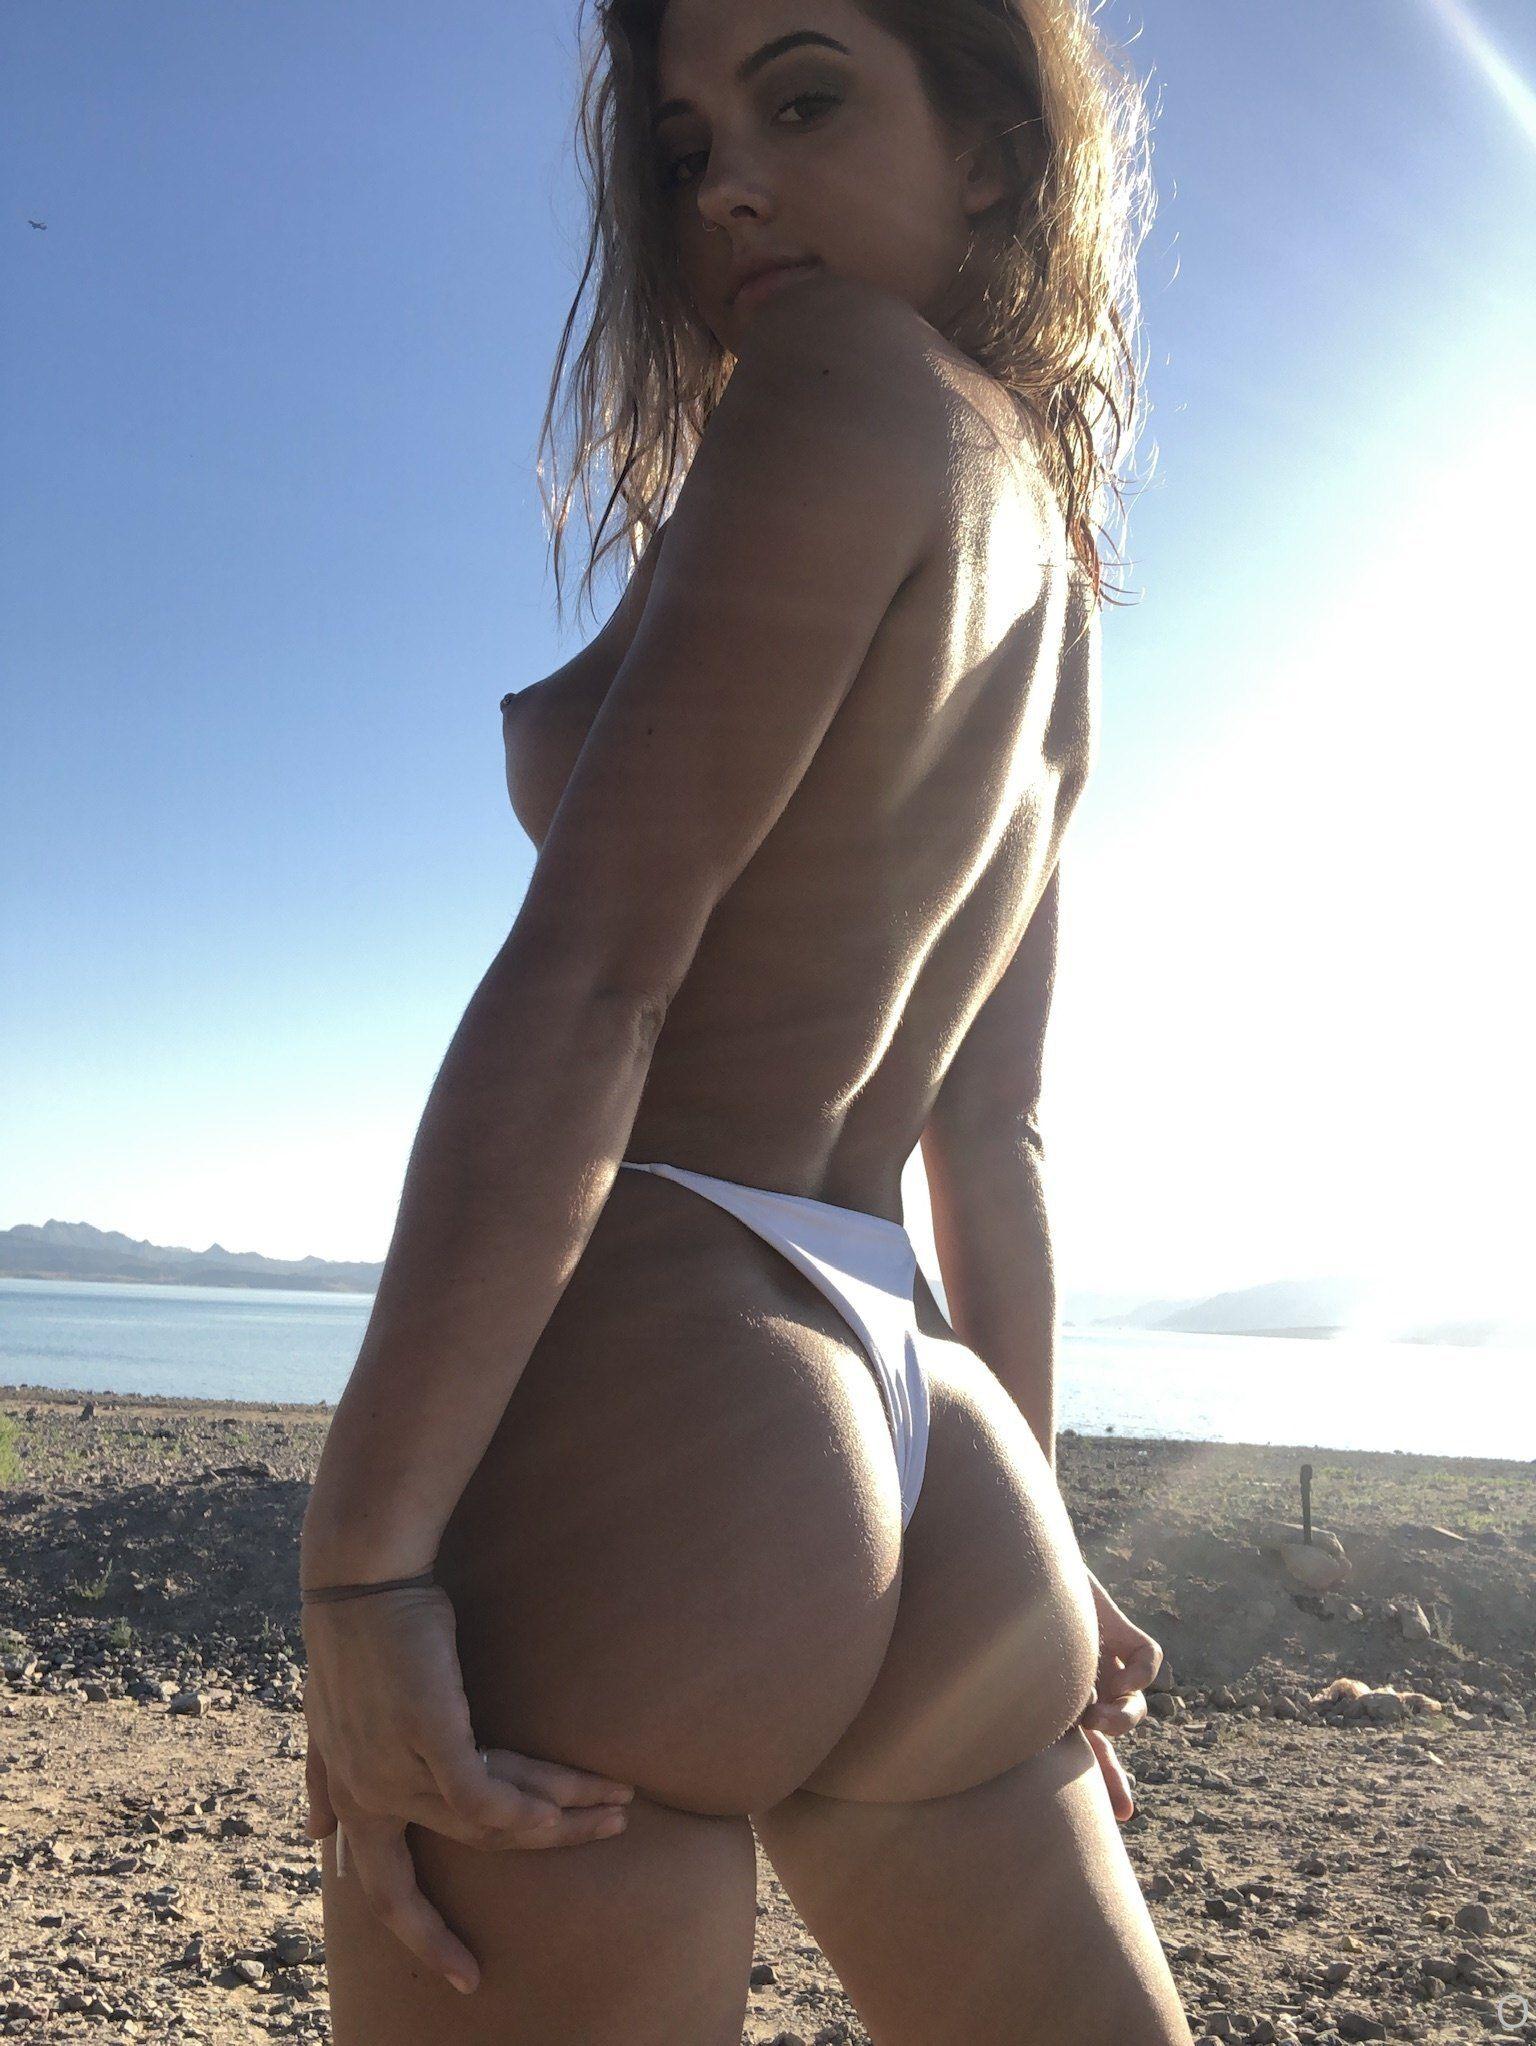 Karly Mergenthaler Nude Photos Onlyfans 0006